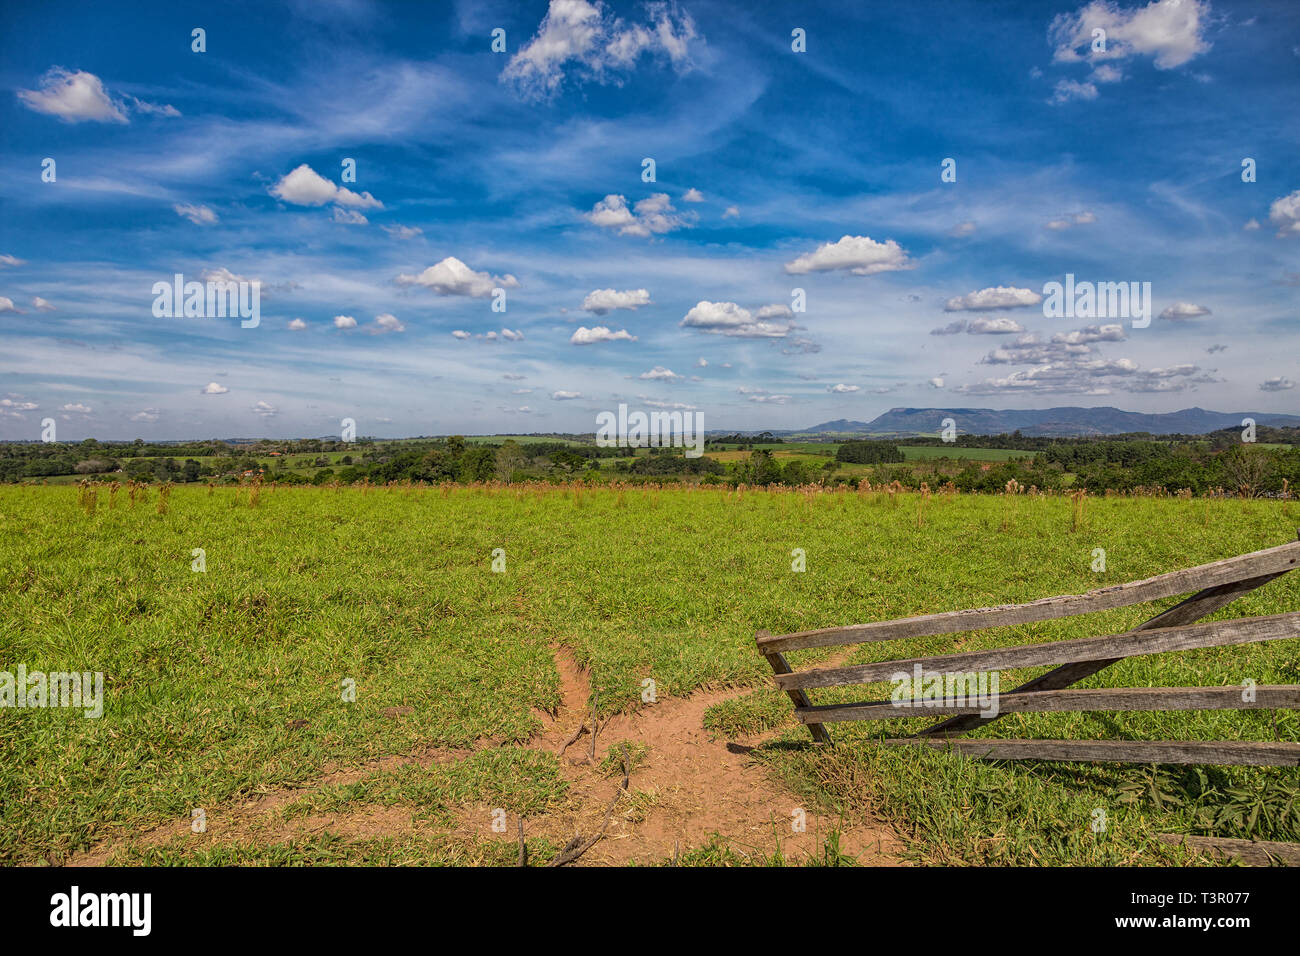 Pastureland in Paraguay overlooking the Ybytyruzu Mountains. - Stock Image